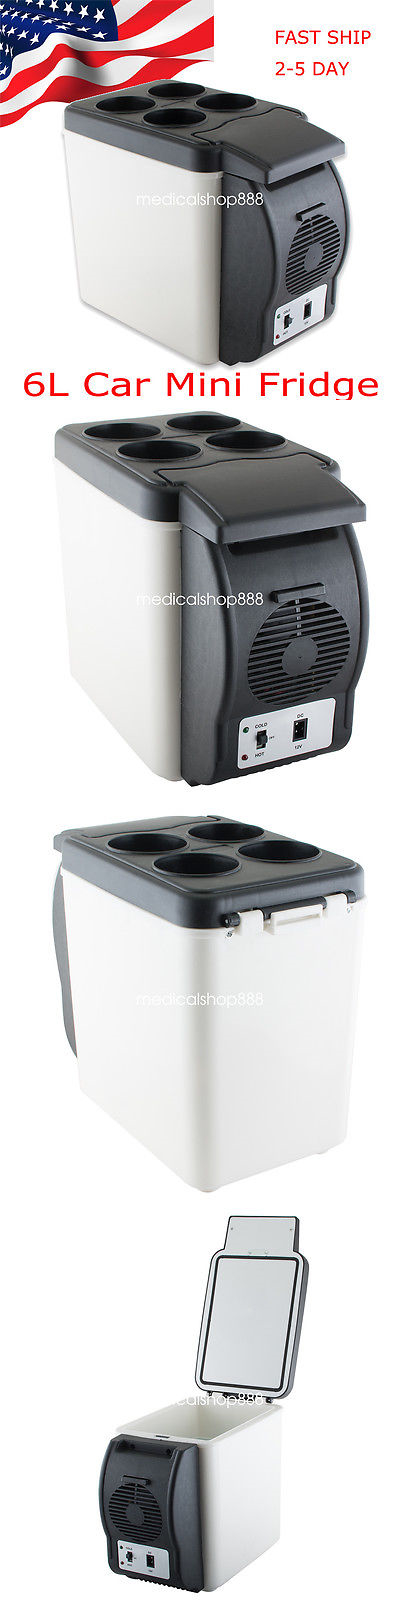 12-Volt Portable Appliances: From Usa!6L Car Refrigerator Fridge ...